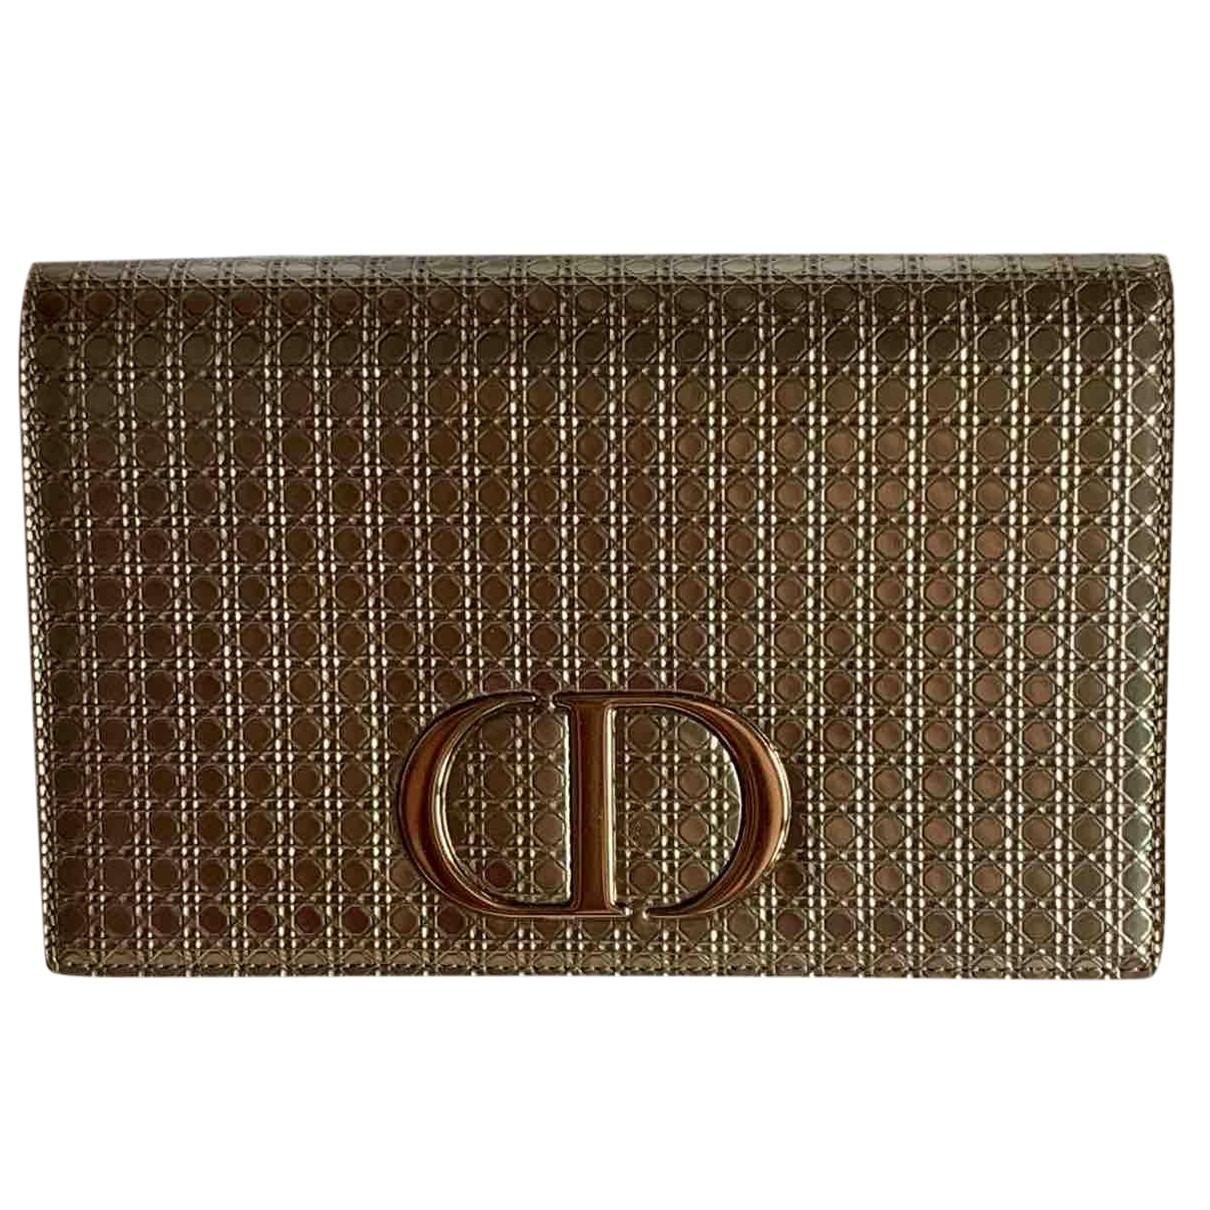 Dior N Gold Leather Clutch bag for Women N